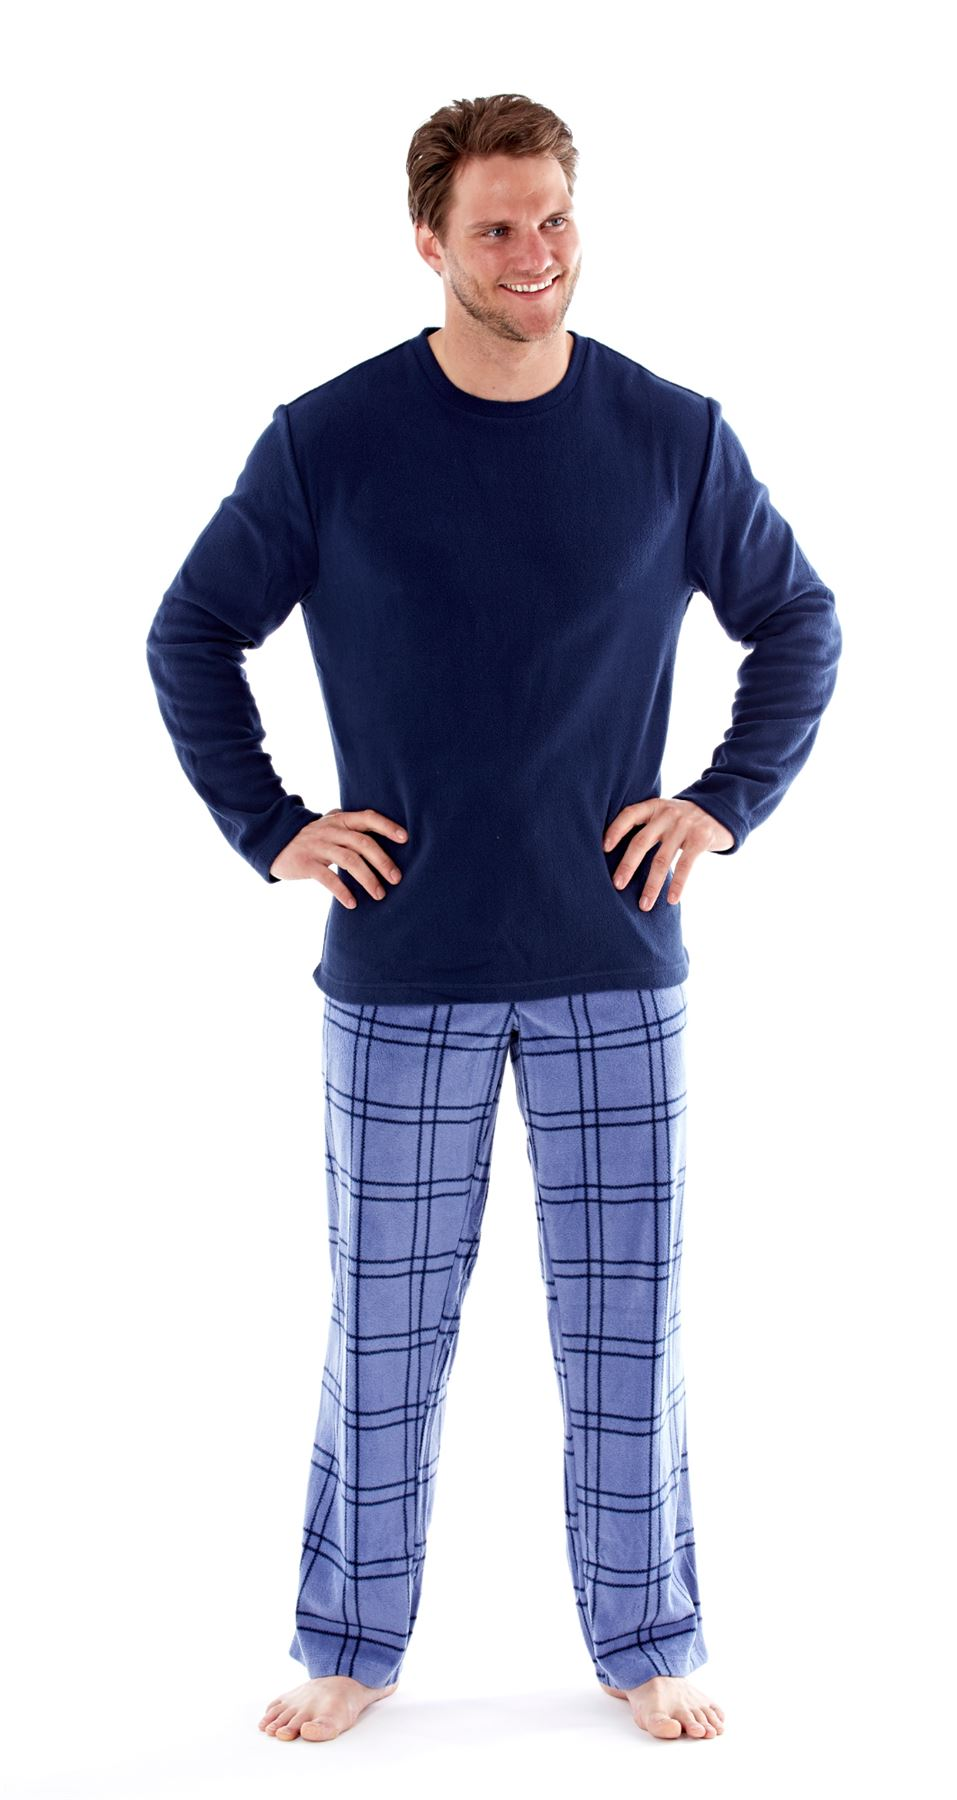 Harvey James Mens Soft Fleece Plain Top Check Bottom Pyjamas MN113 MN114